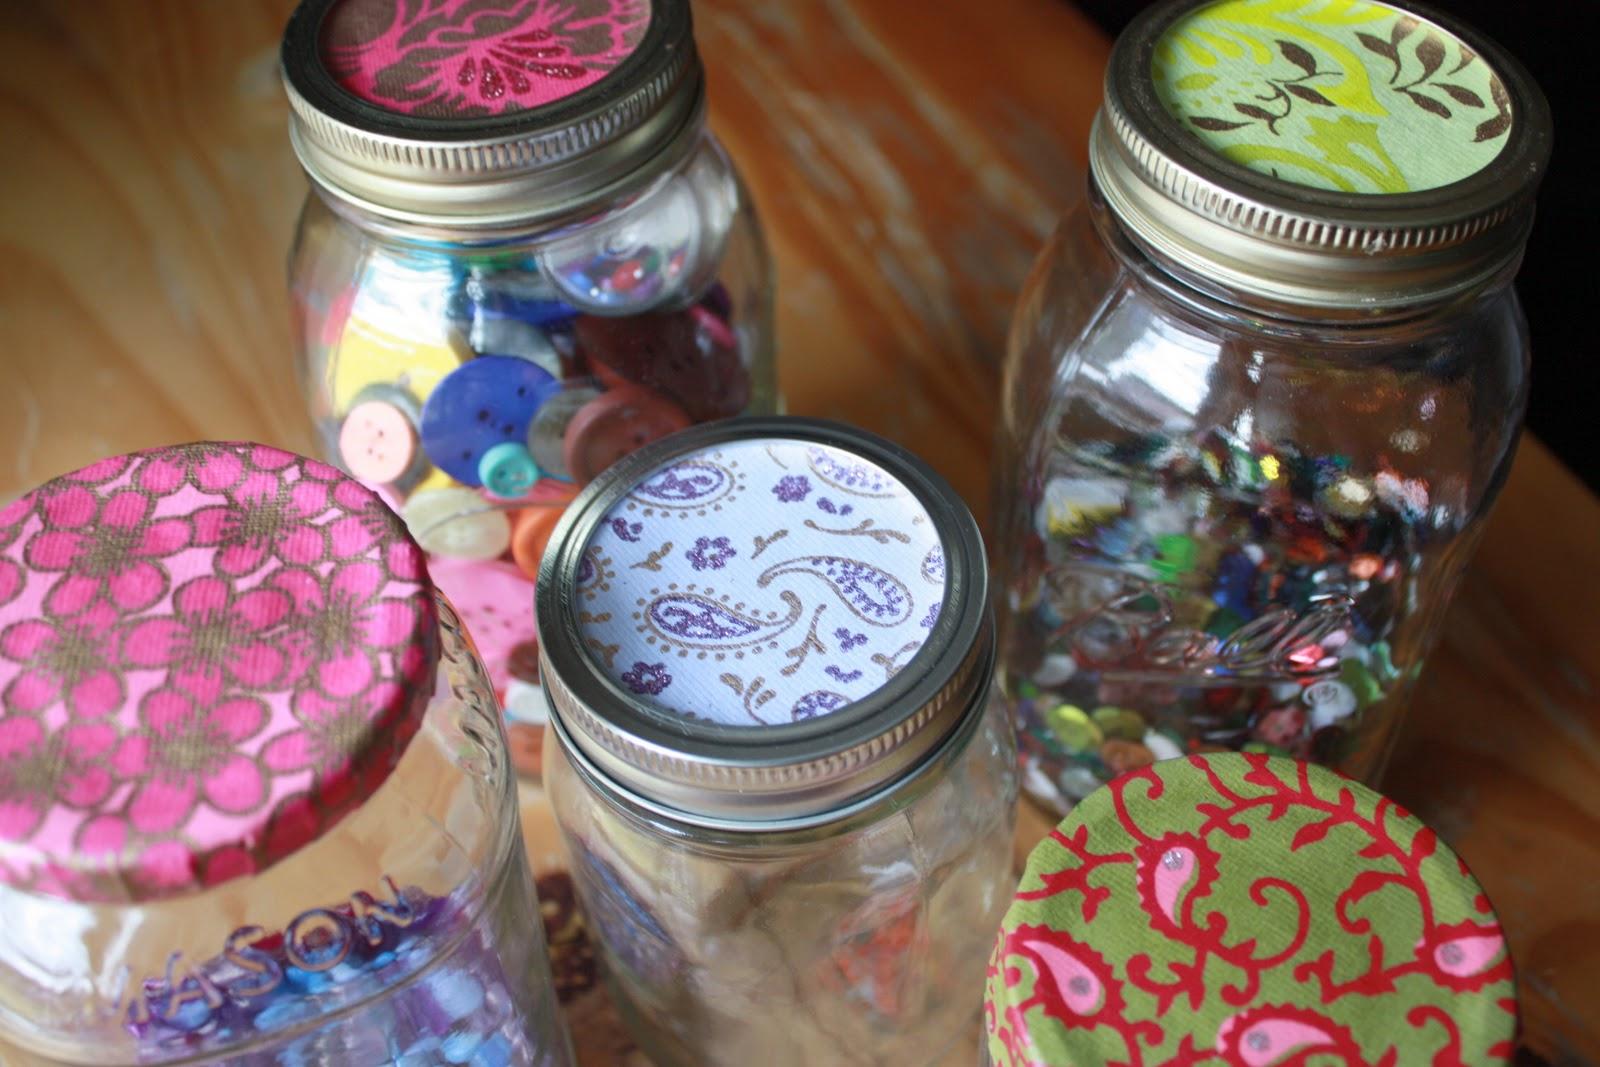 Mason Jar Lid Decorations The Sweet Spot Howto Pimp your Mason Jars 52 & Decorative Jars: mason jar lid decorations | carinsurancepaw.top